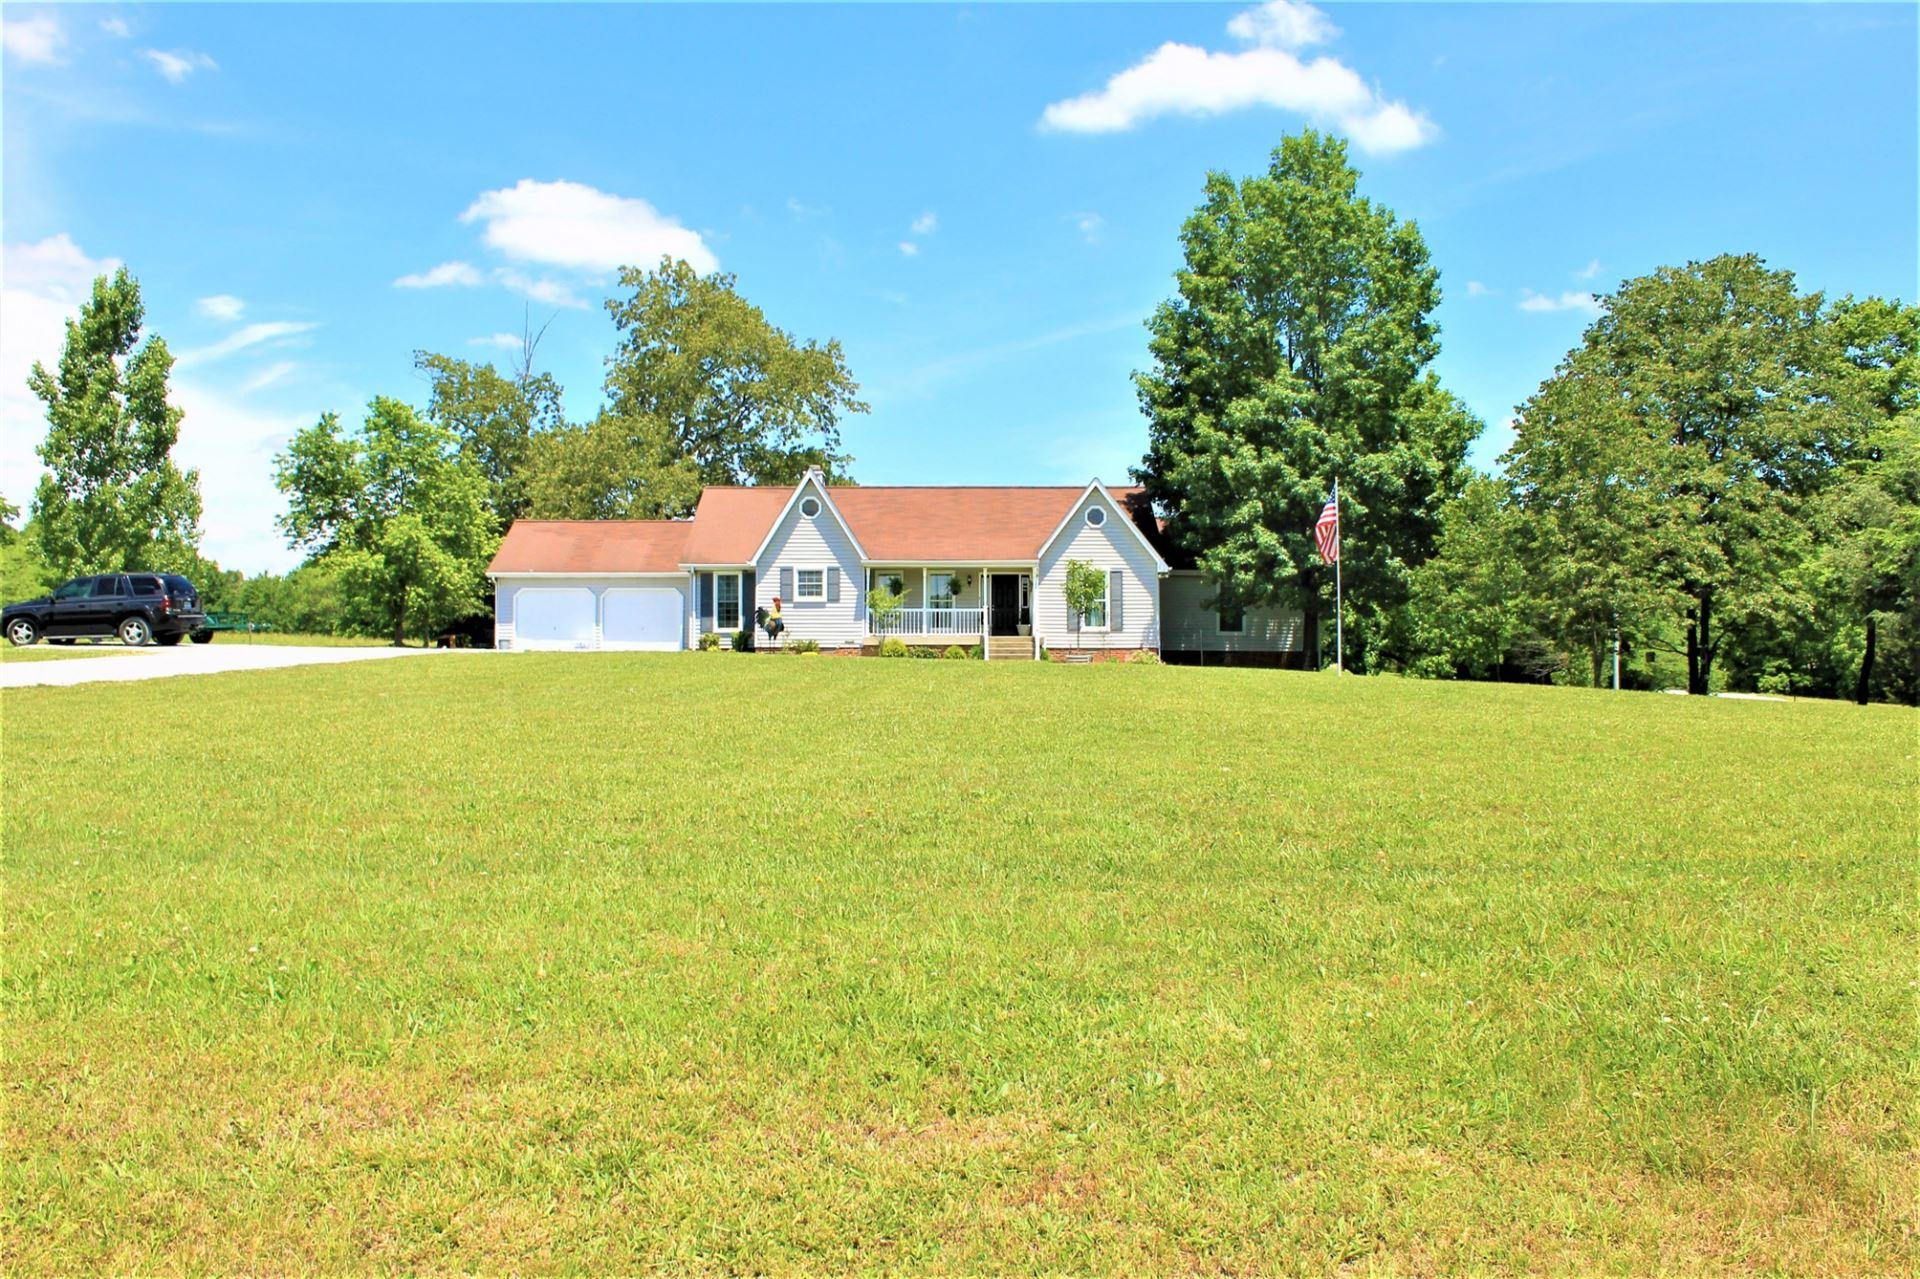 2868 Joe Dowlen Rd, Pleasant View, TN 37146 - MLS#: 2257282